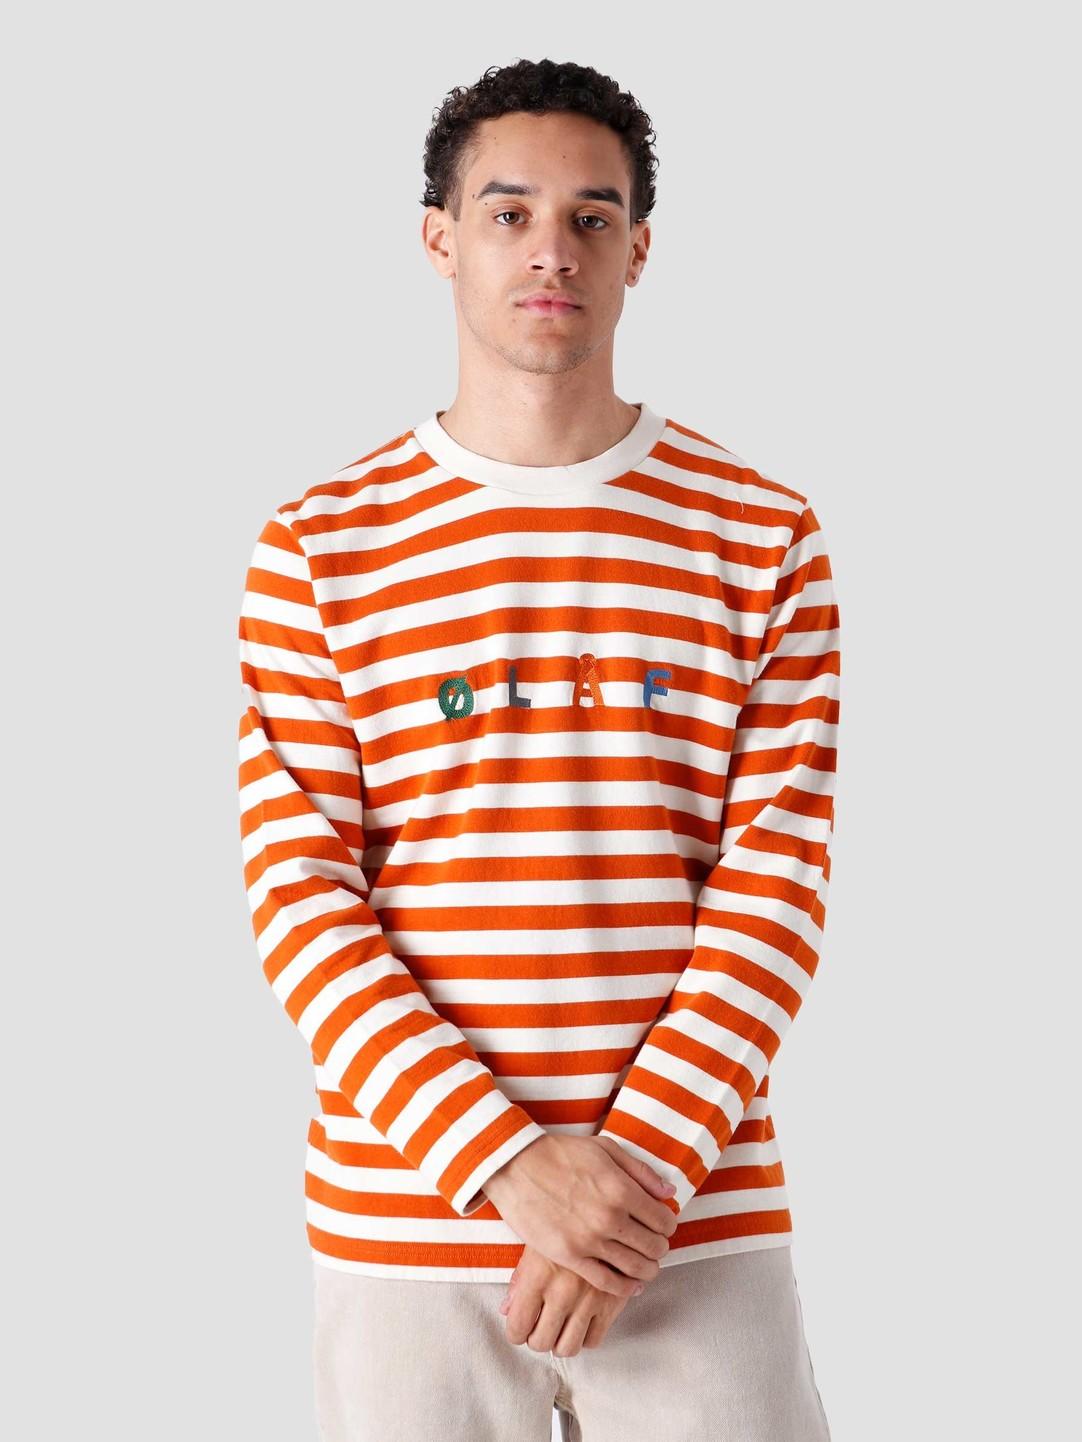 Olaf Hussein Olaf Hussein OH Stripe Sans Longsleeve T-Shirt Burnt Orange White